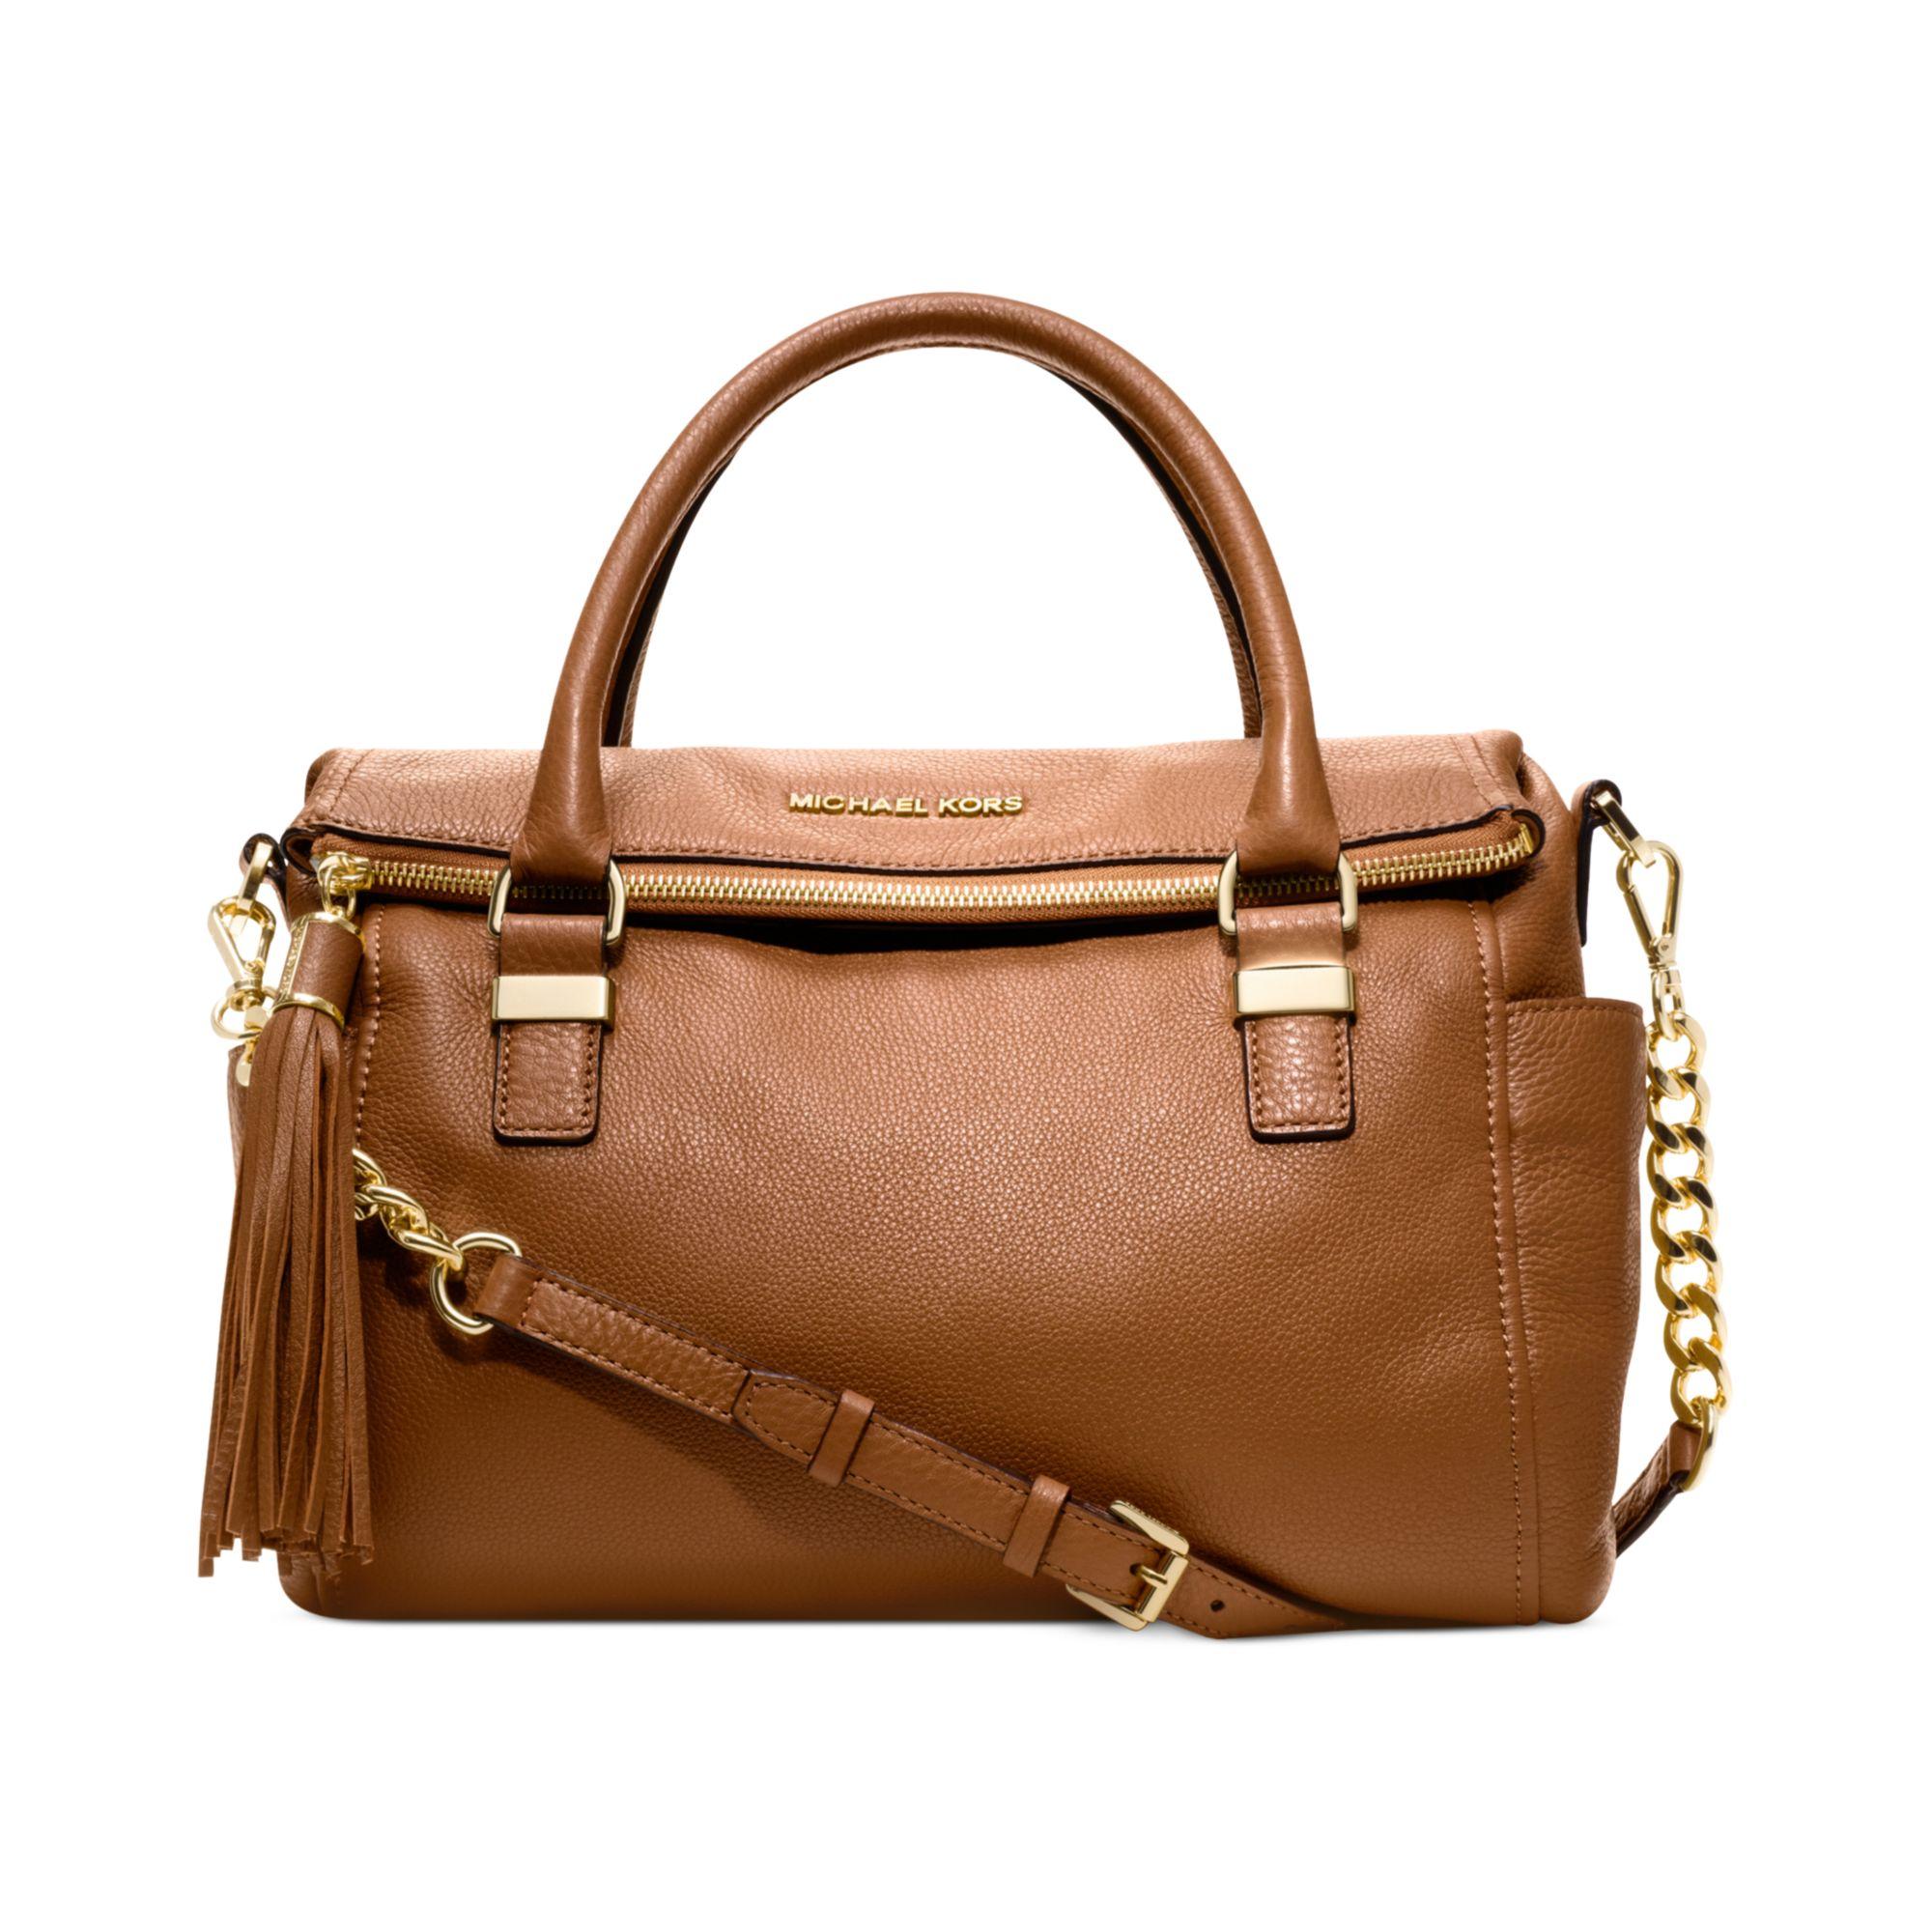 lyst michael kors weston medium satchel in brown rh lyst com